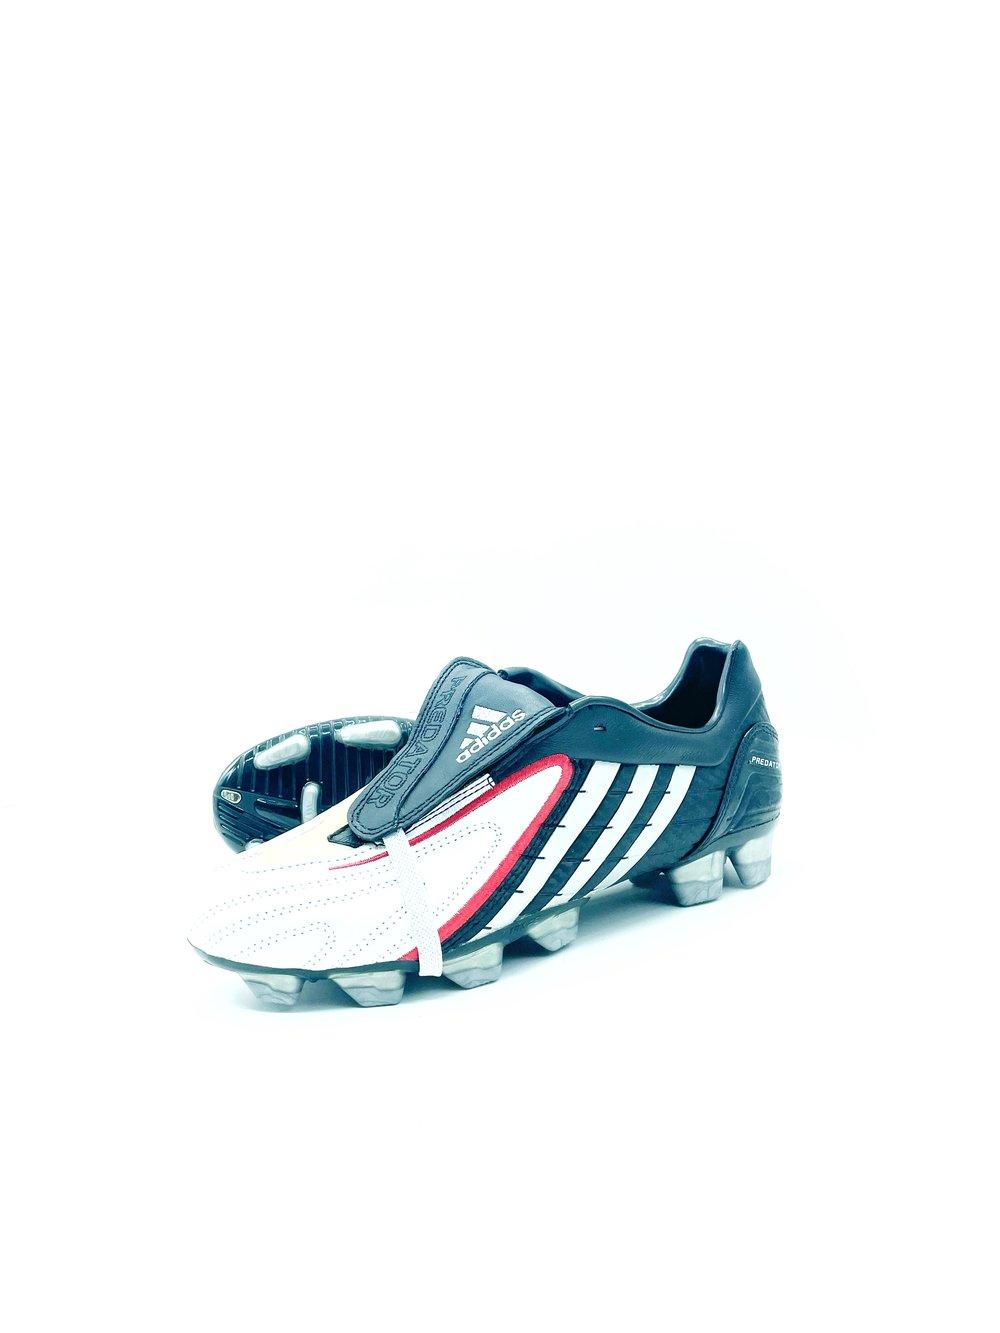 Image of Adidas Predator Abs FG black grey